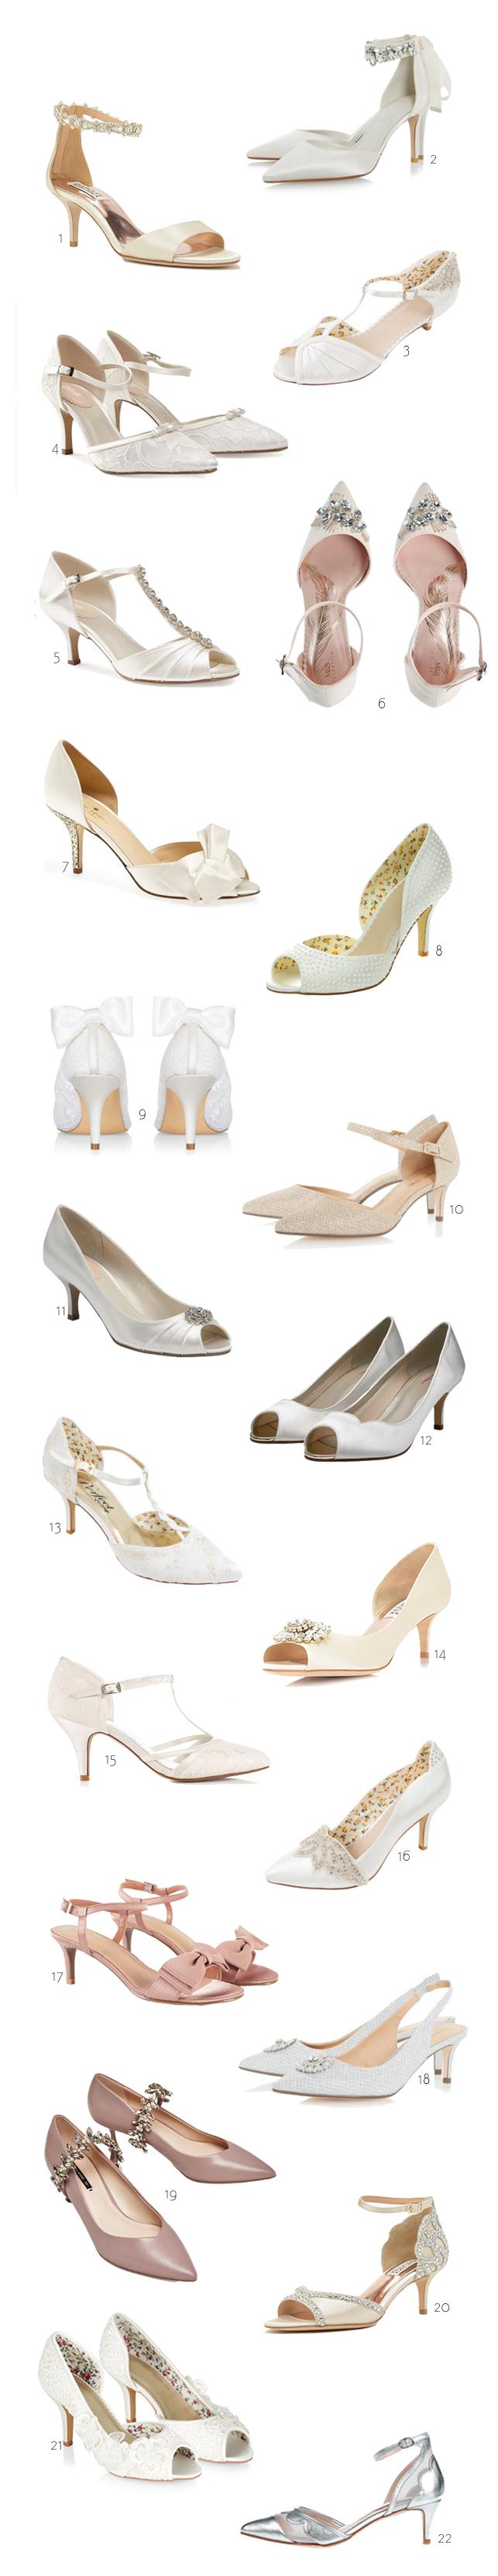 22 Gorgeous Low And Mid Heel Wedding Shoes Weddingsonline